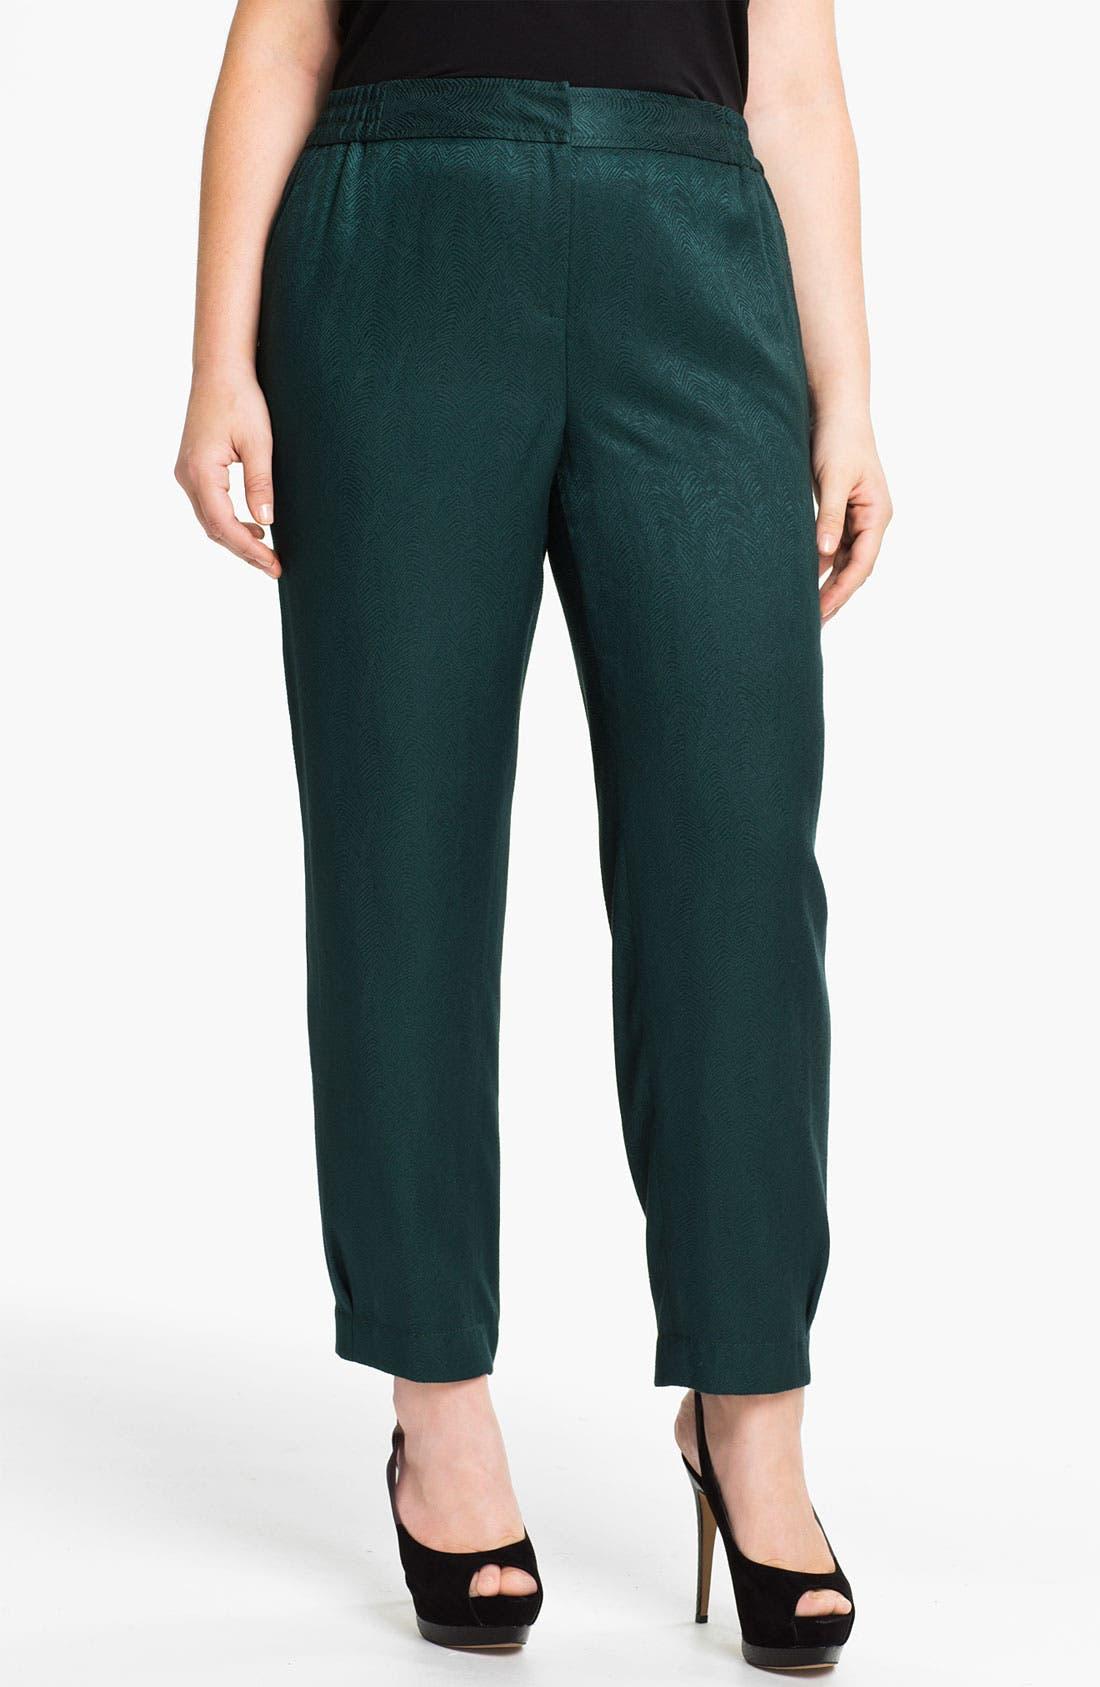 Alternate Image 1 Selected - Sejour Slim Jacquard Pants (Plus)